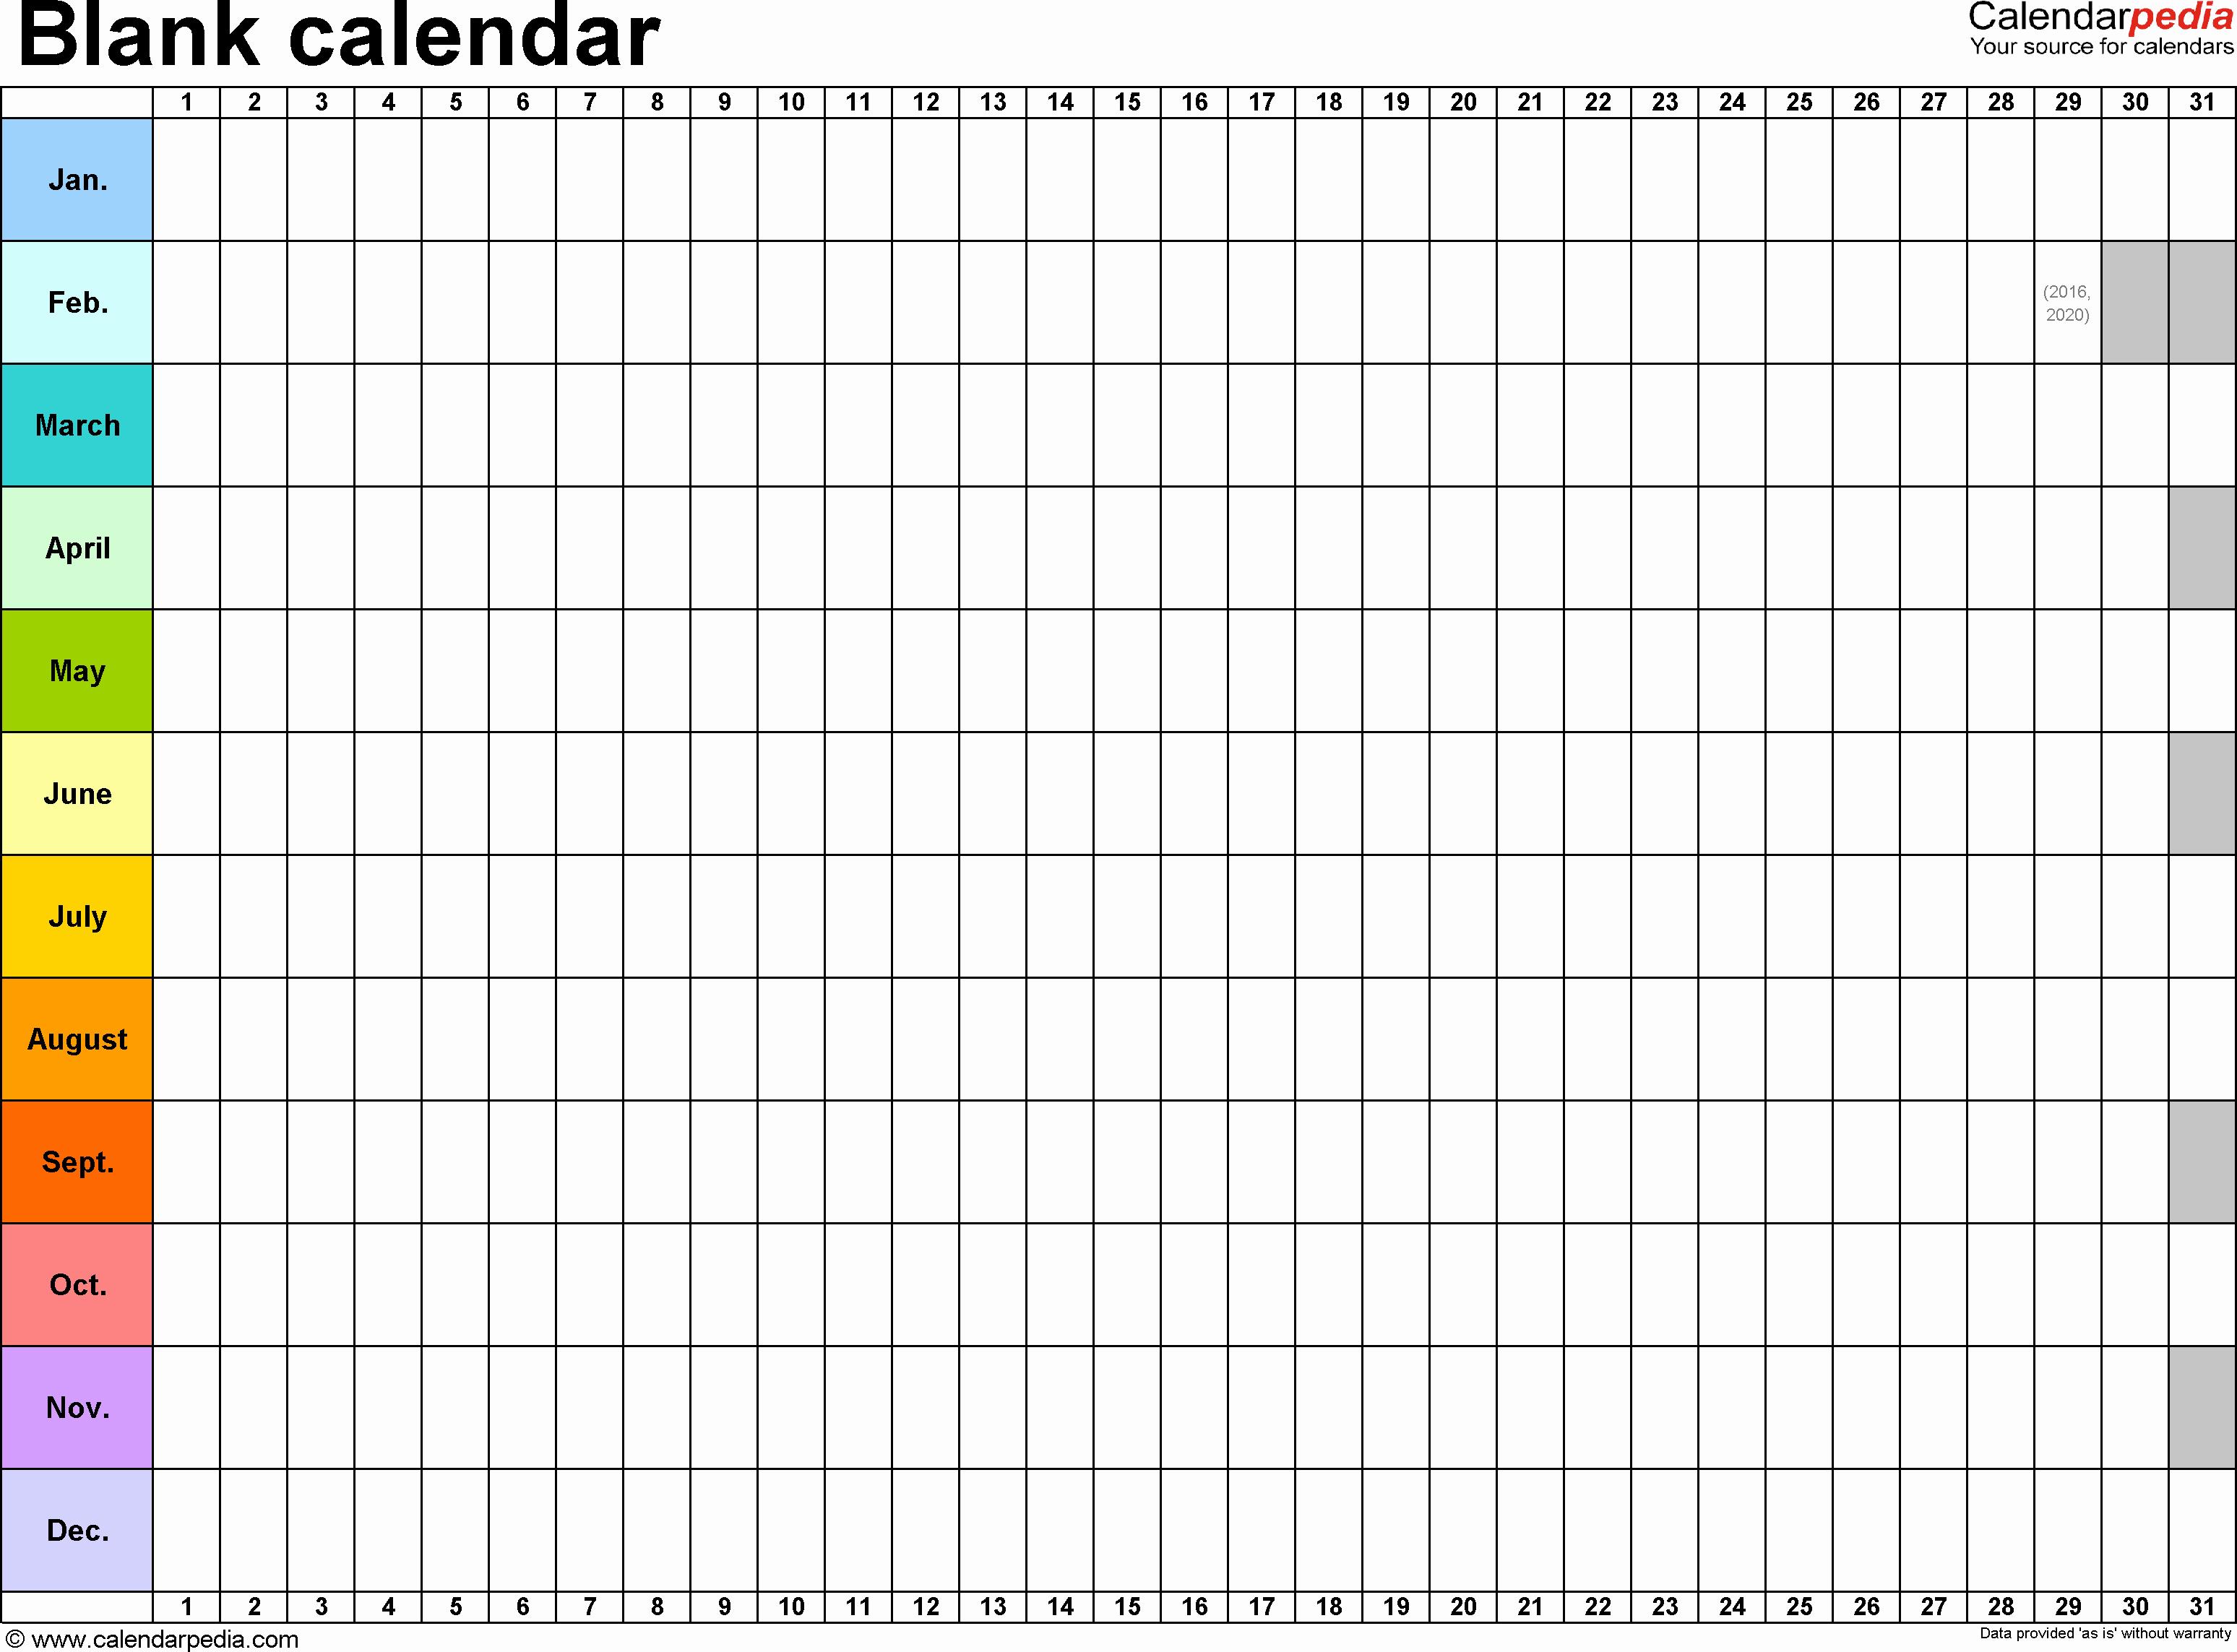 Blank Monthly Calendar Template Pdf Elegant Blank Calendars Free Printable Pdf Templates